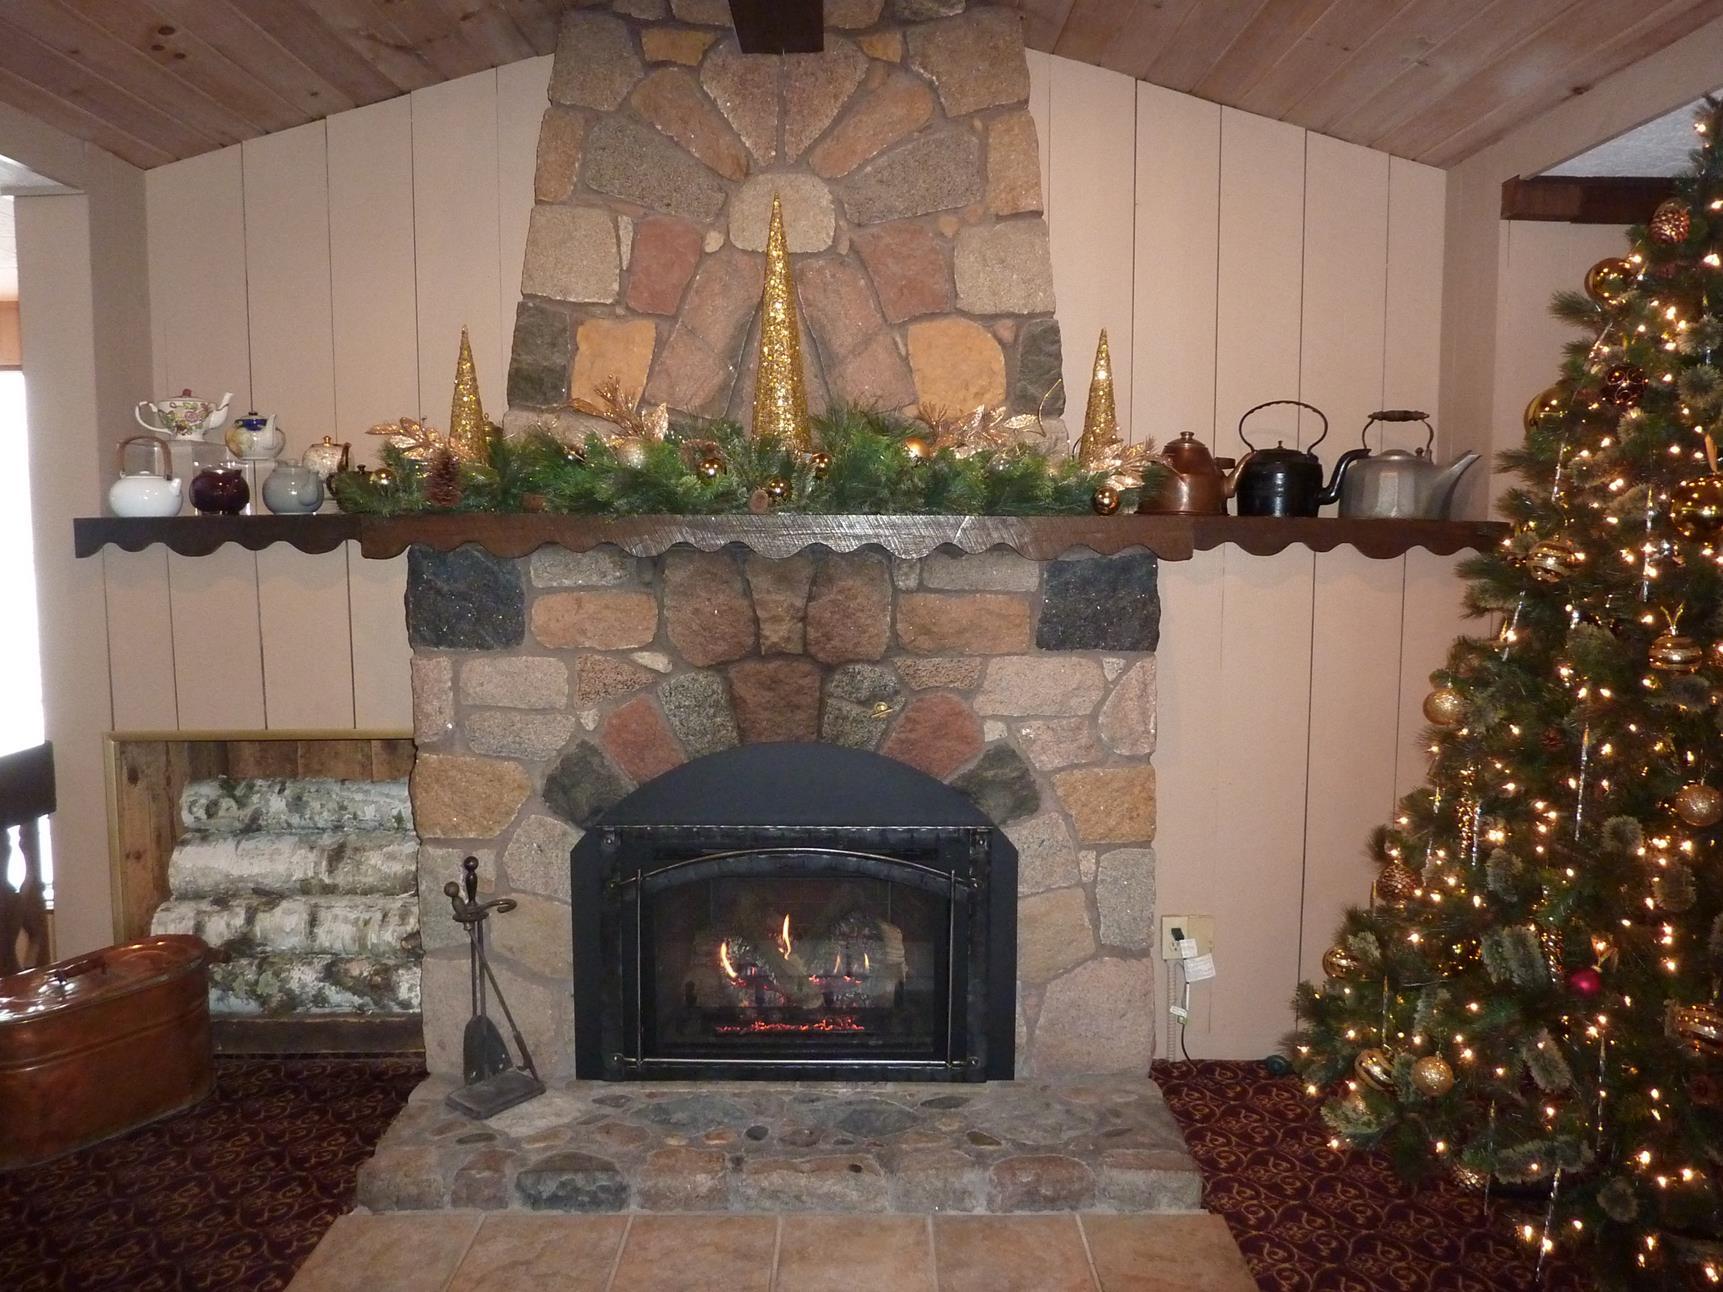 Cozy fireplace room at Cragun's Resort